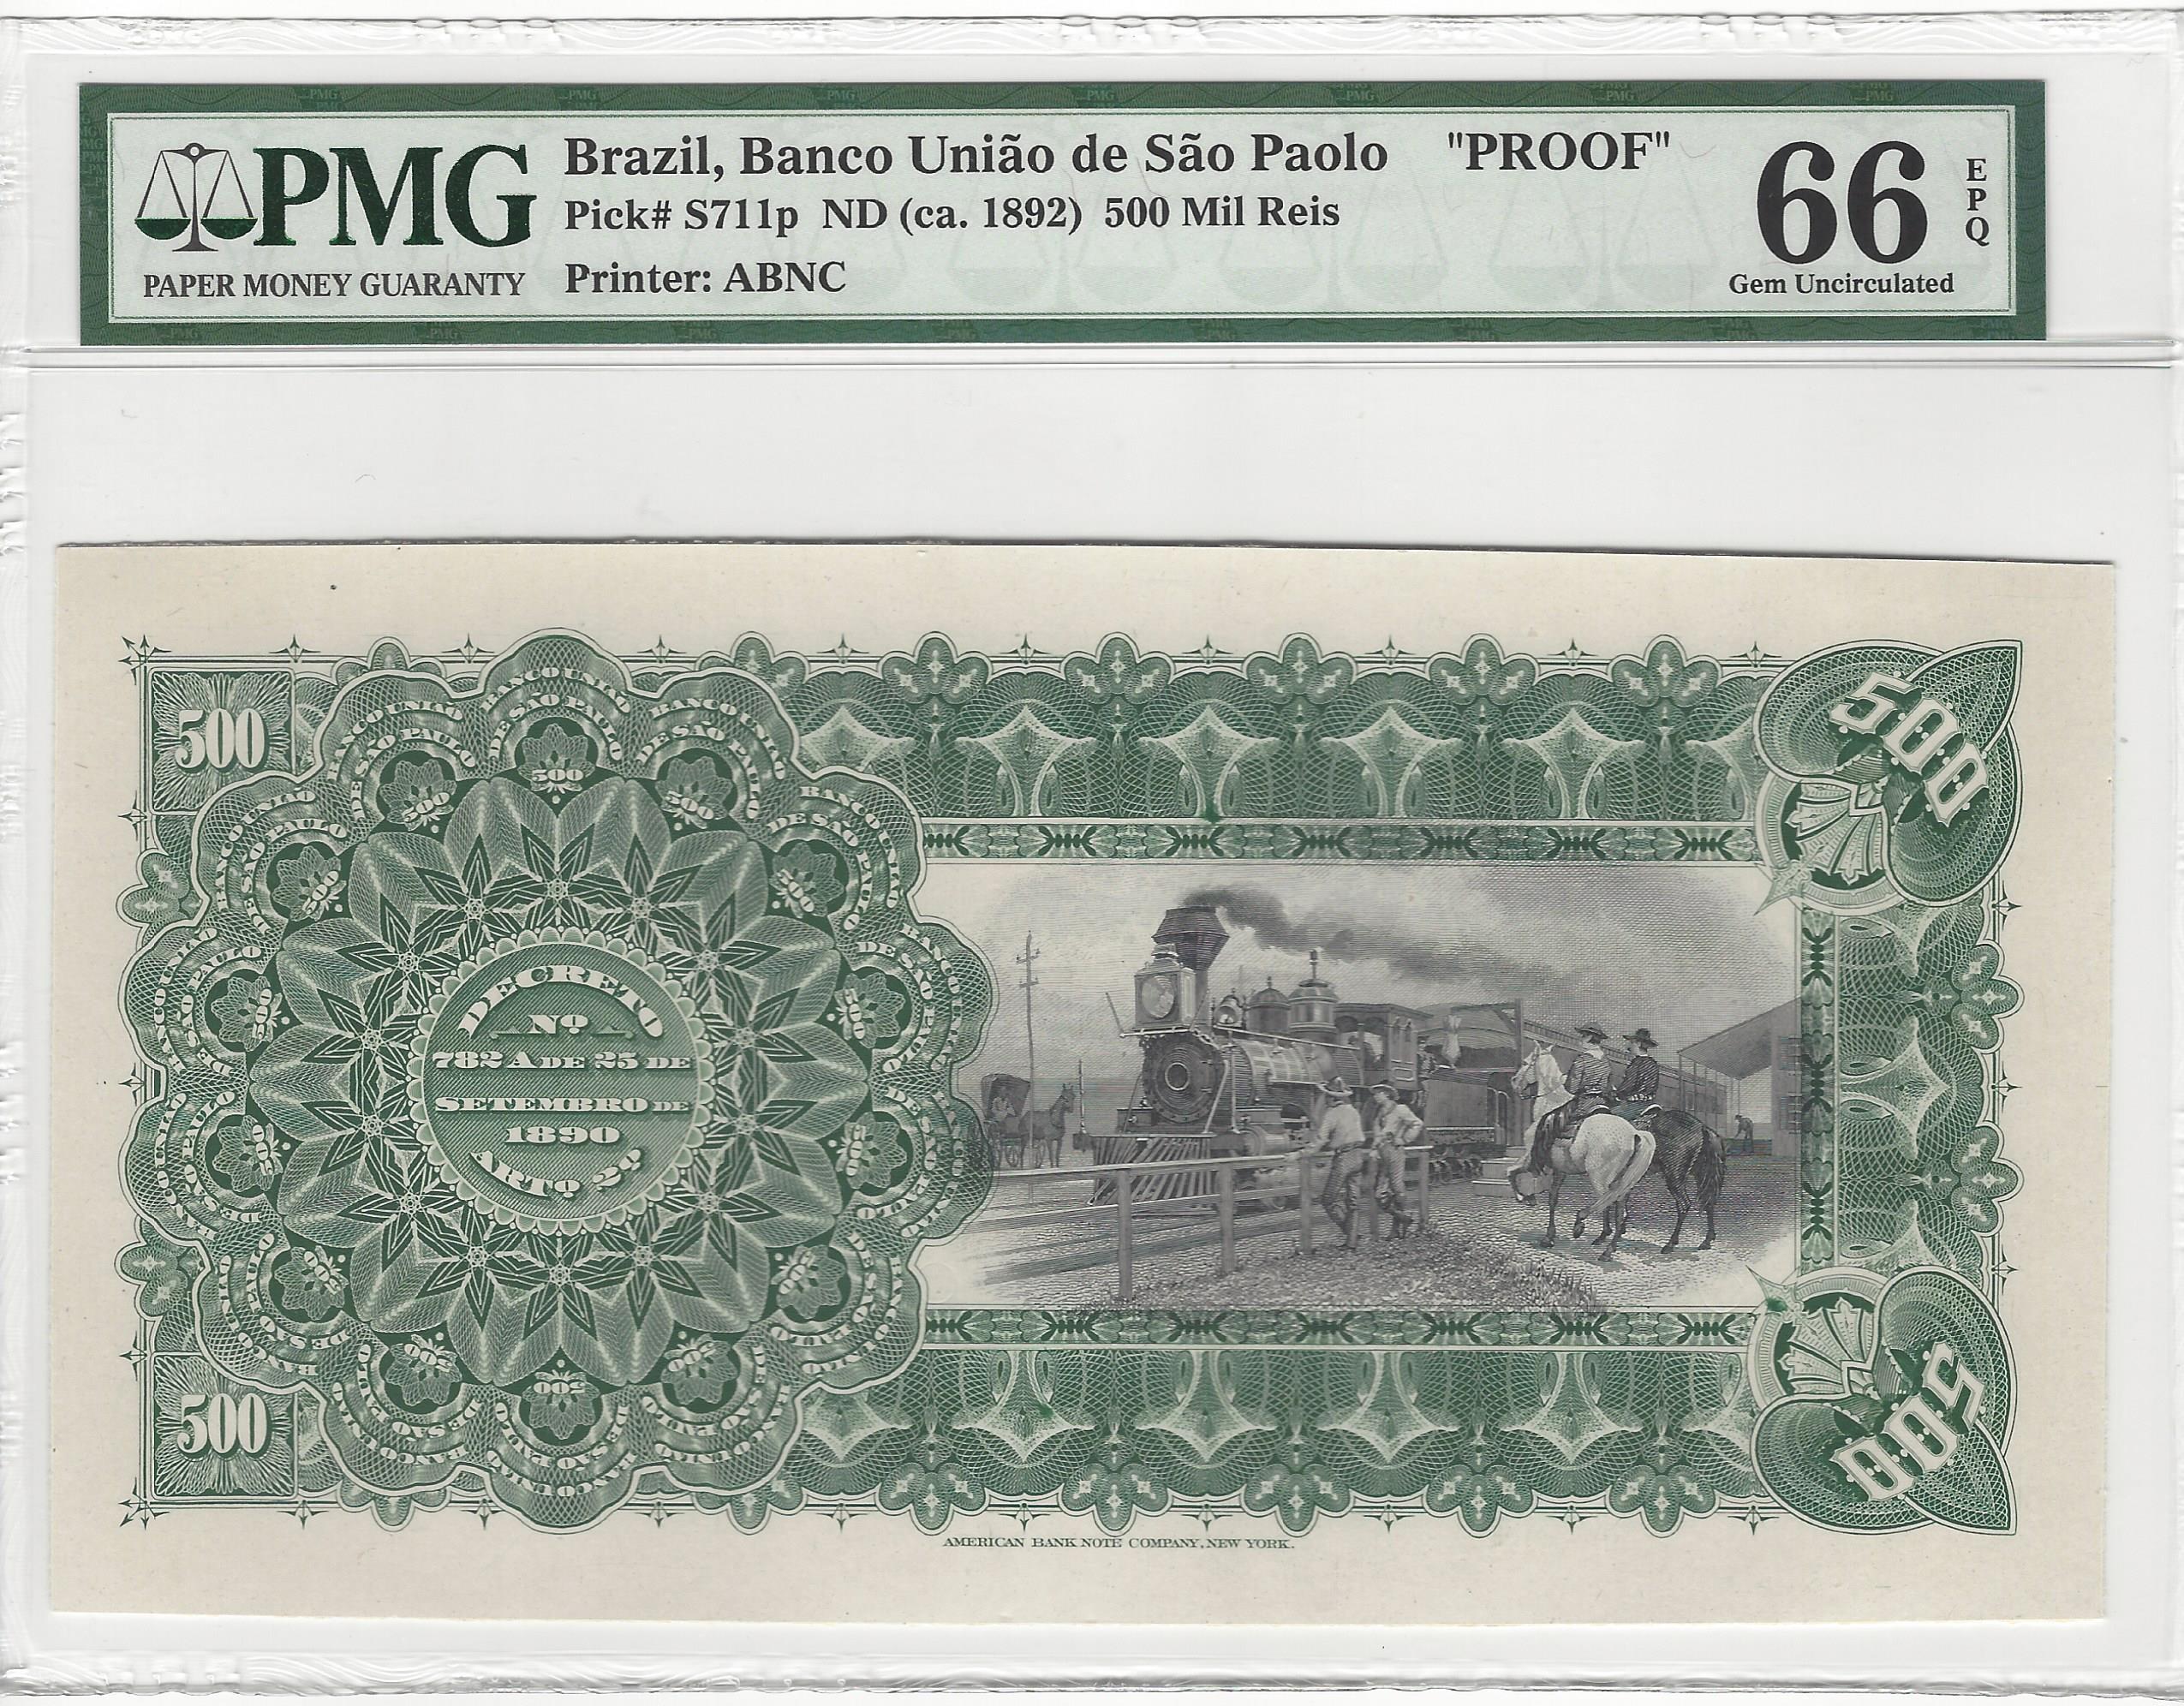 Click image for larger version - Name: Brazil Banco Proof.jpg, Views: 61, Size: 1007.29 KB